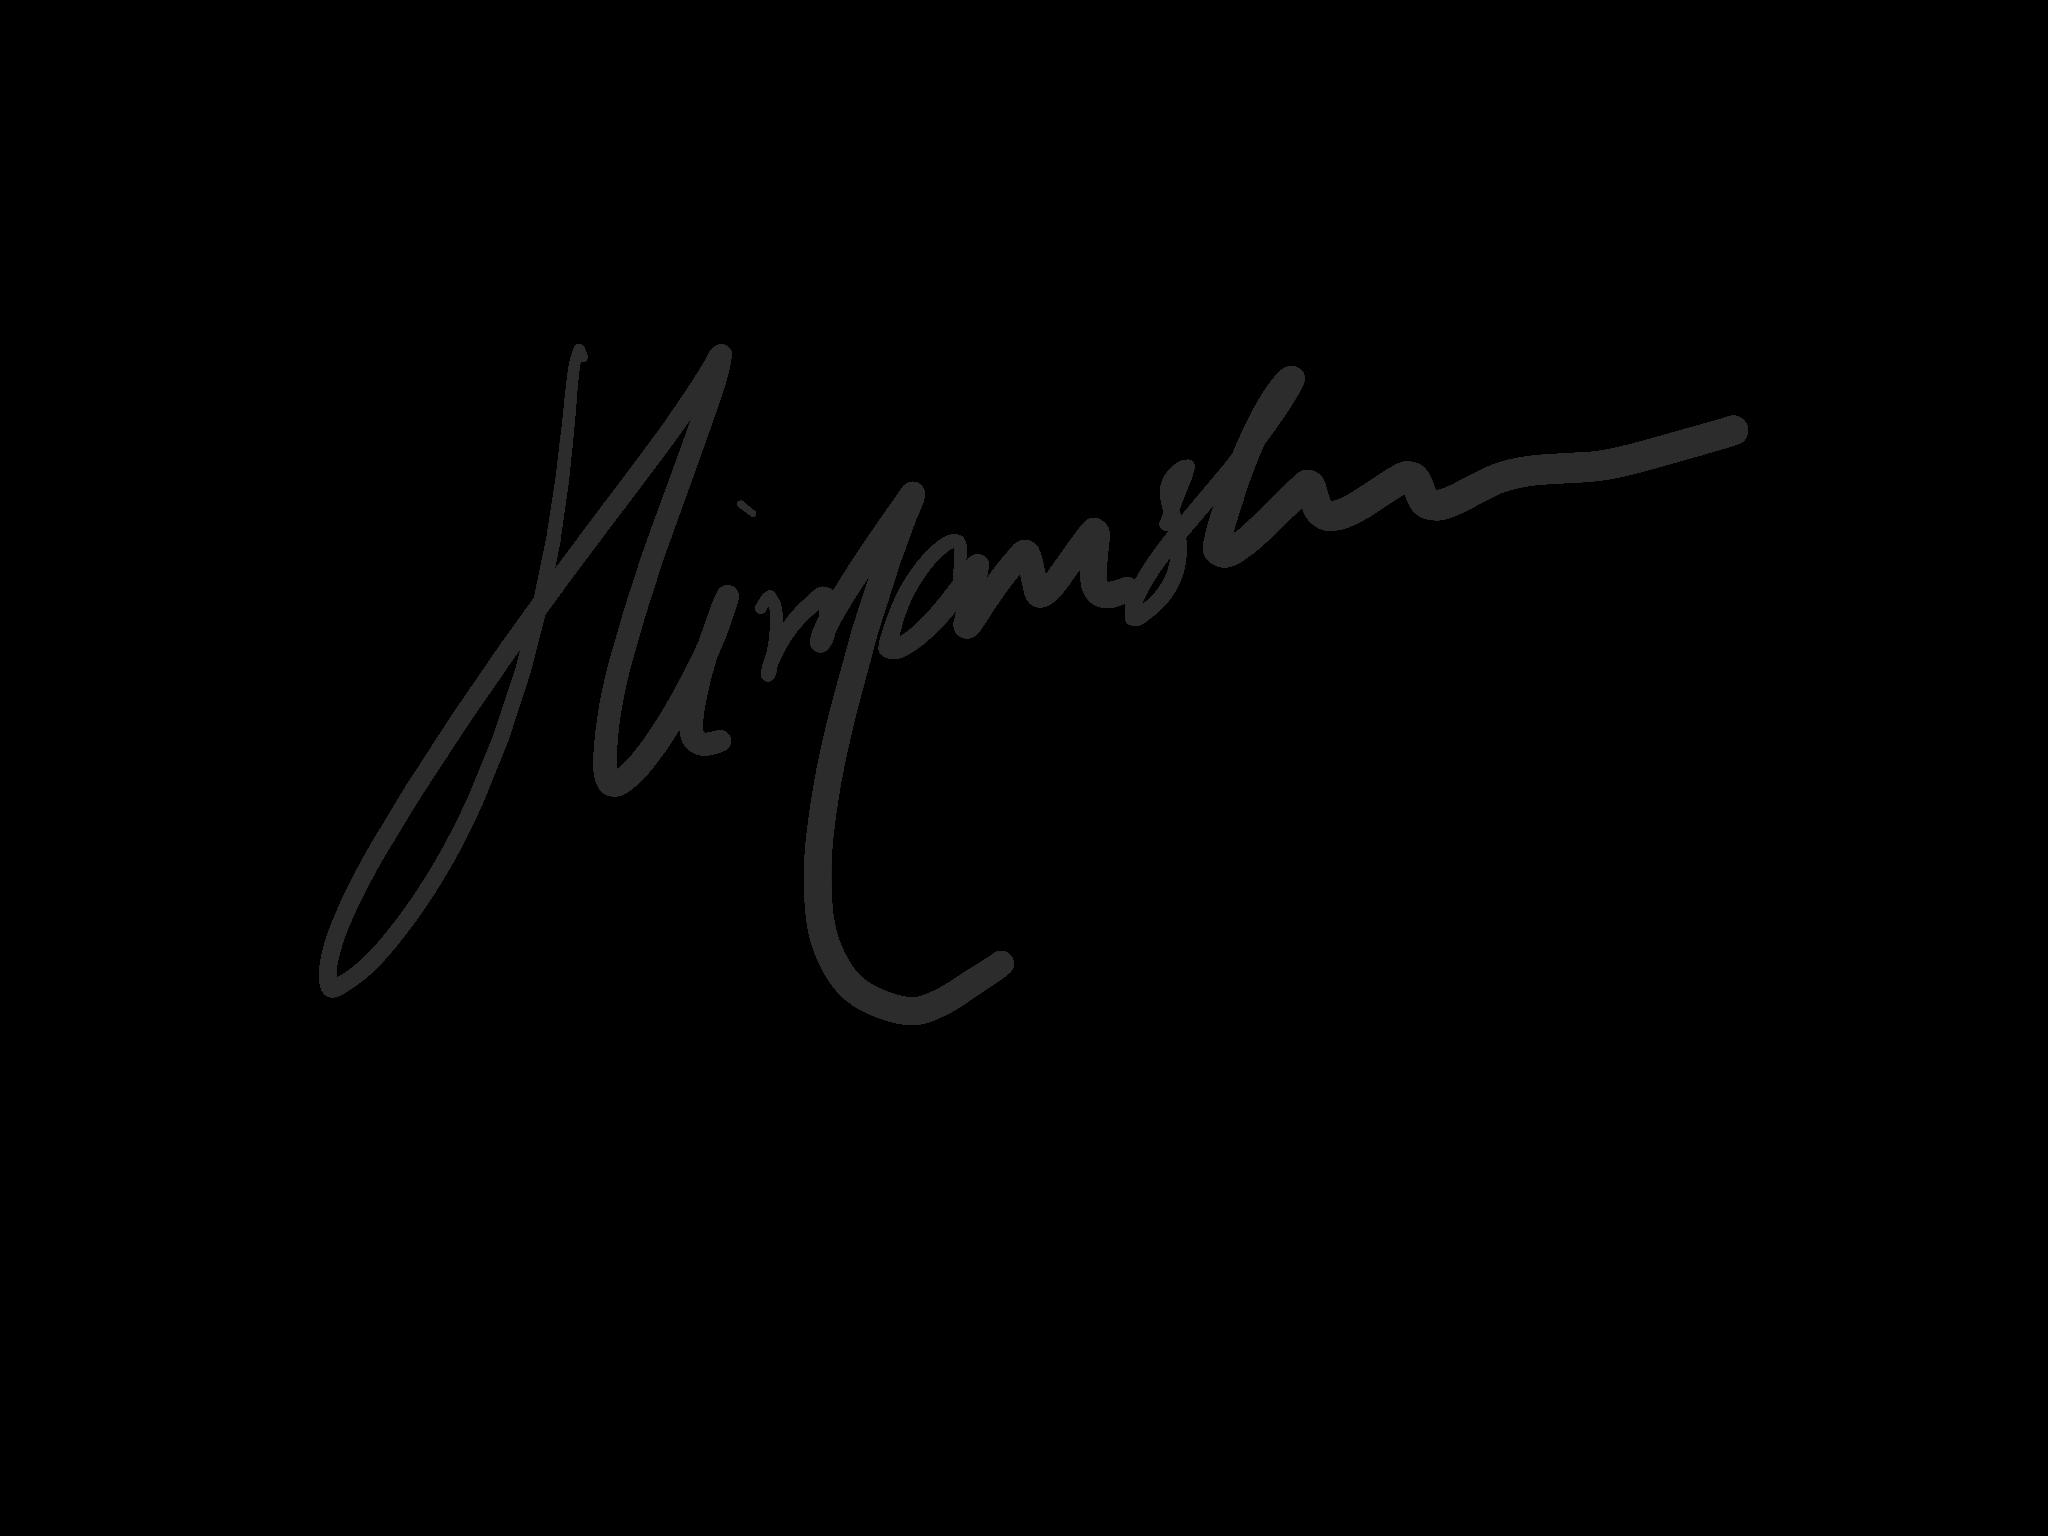 Himanshu Bharadwaj's Signature